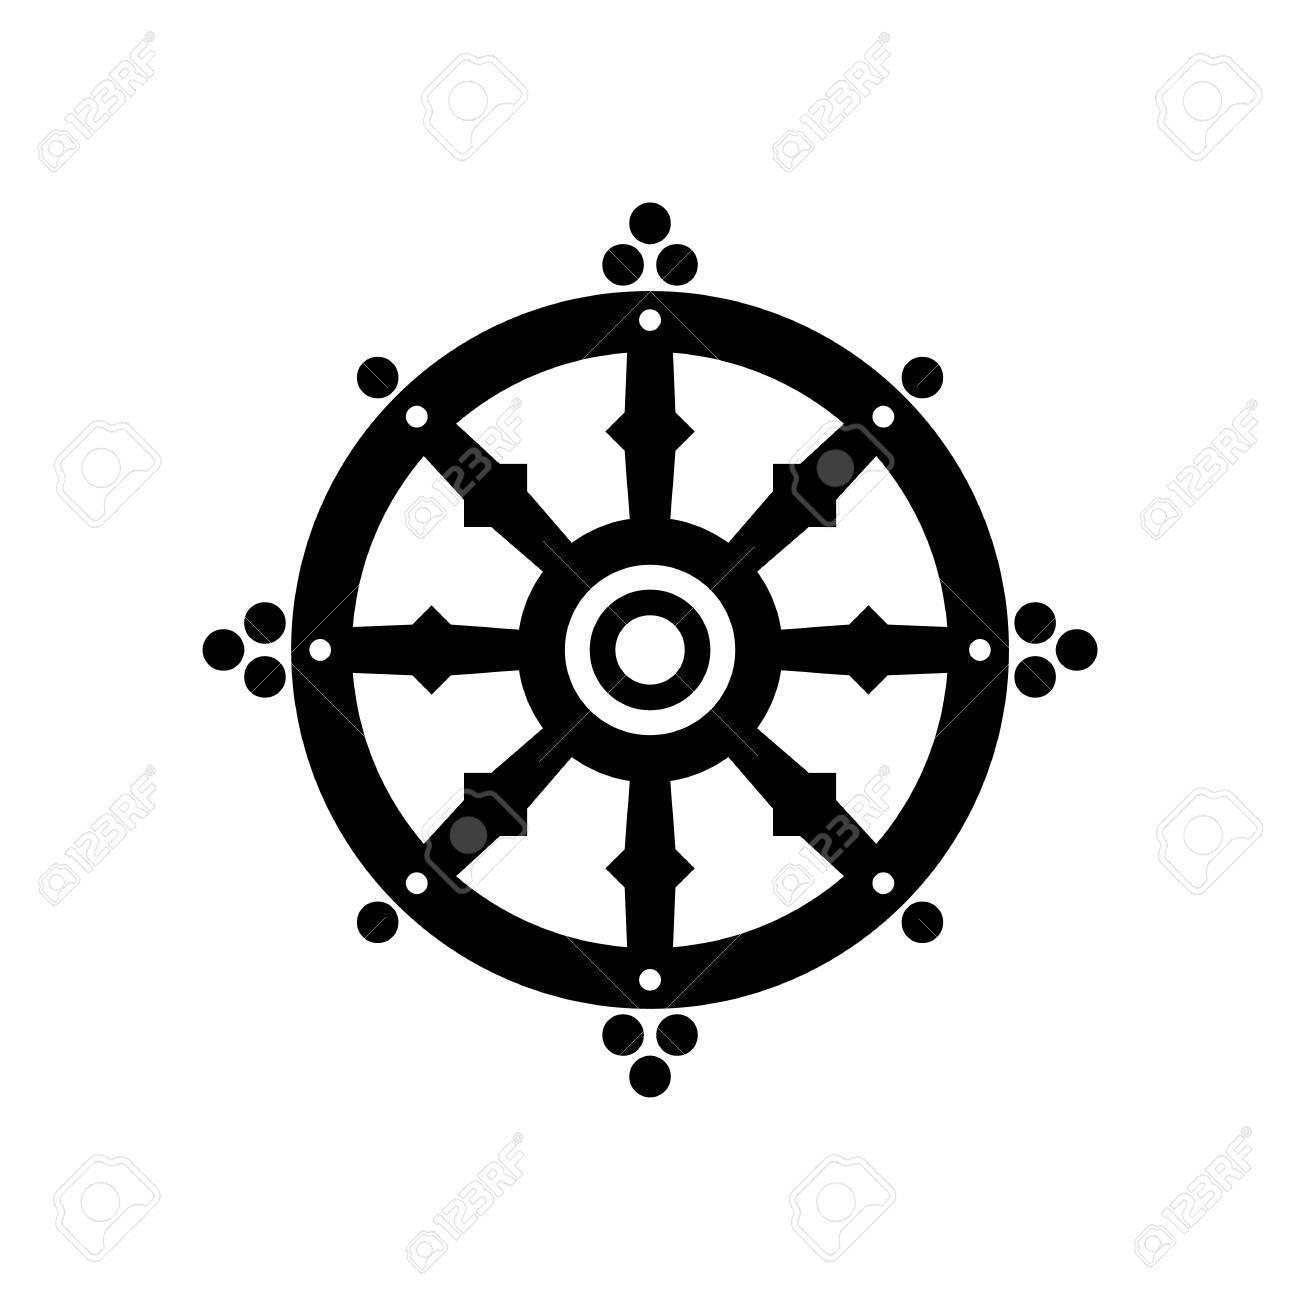 Berühmt Dharma-Glücksrad, Spiritualität, Religiöses Symbol Des Buddhismus @AI_01